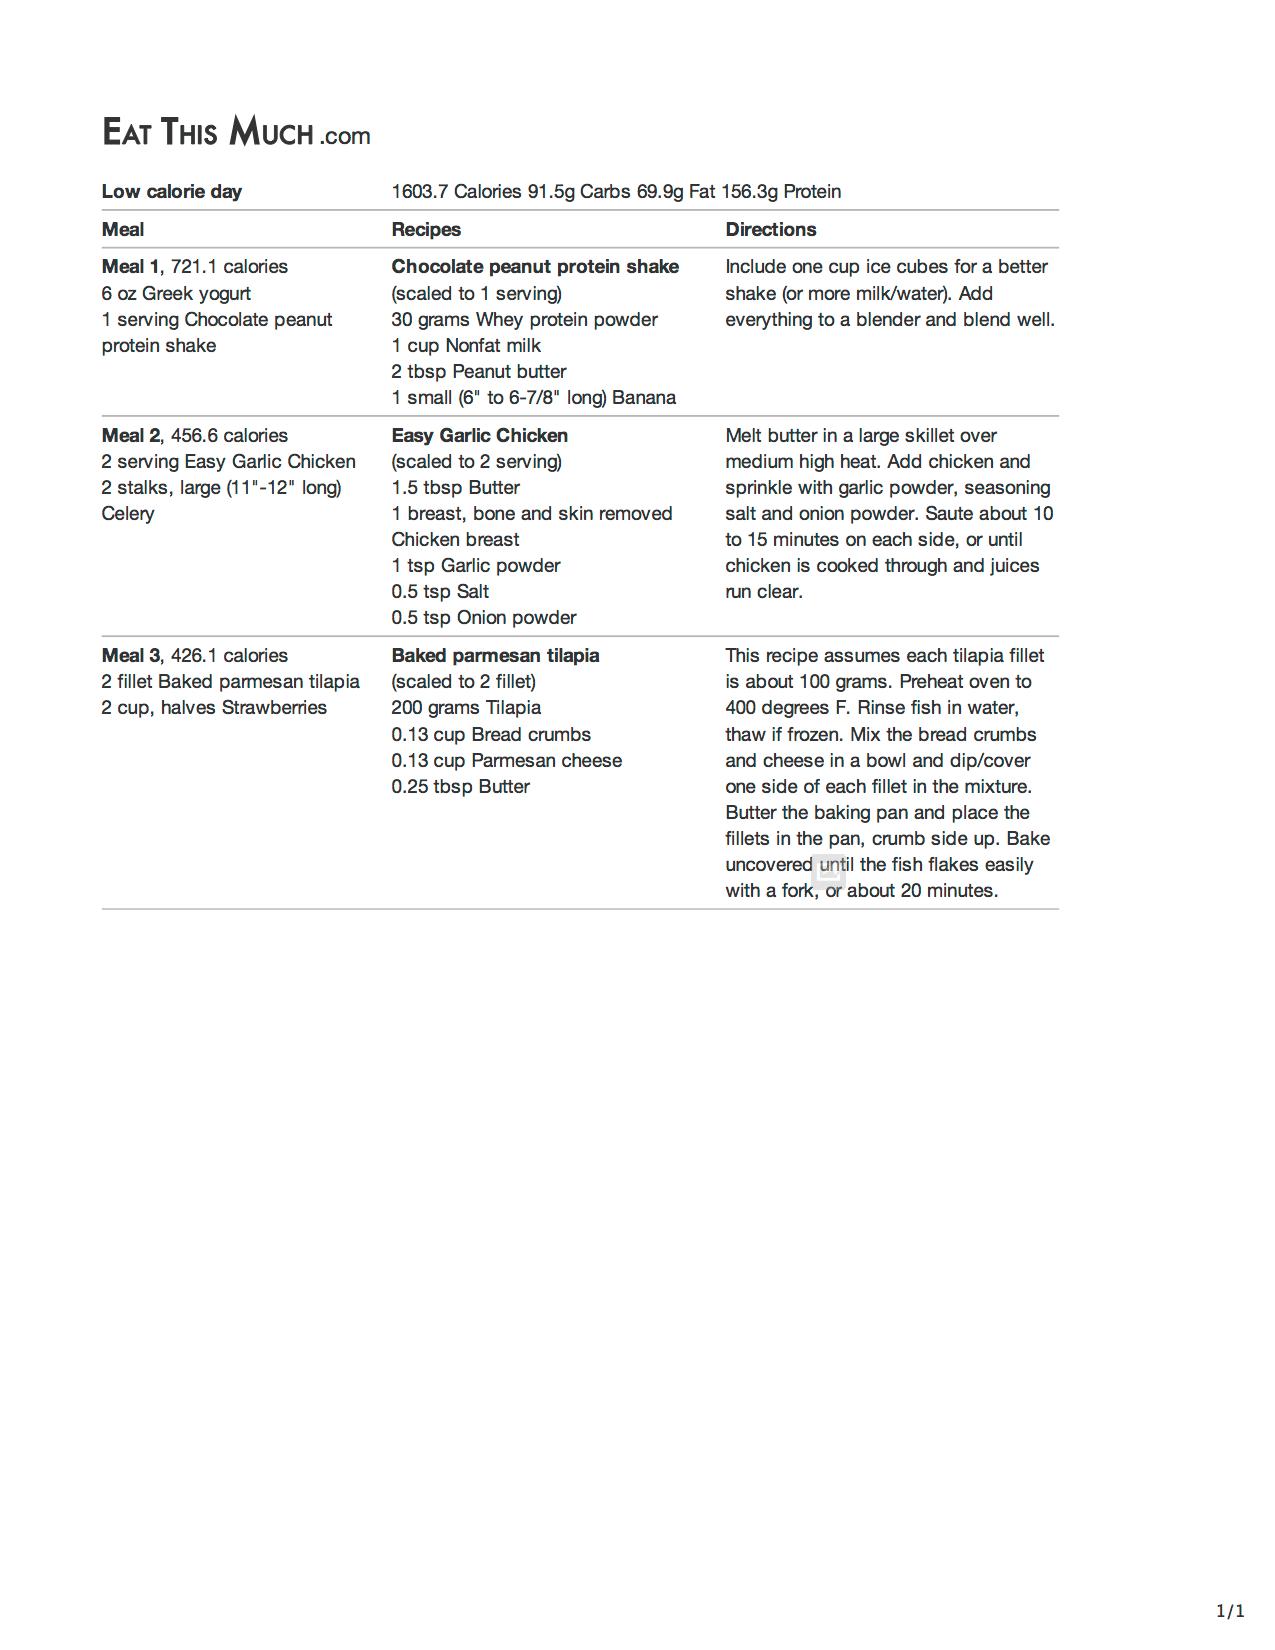 009 Essay Example Healthy Eating Sample Meal Plan Impressive Topics Spm Habits Pdf Full